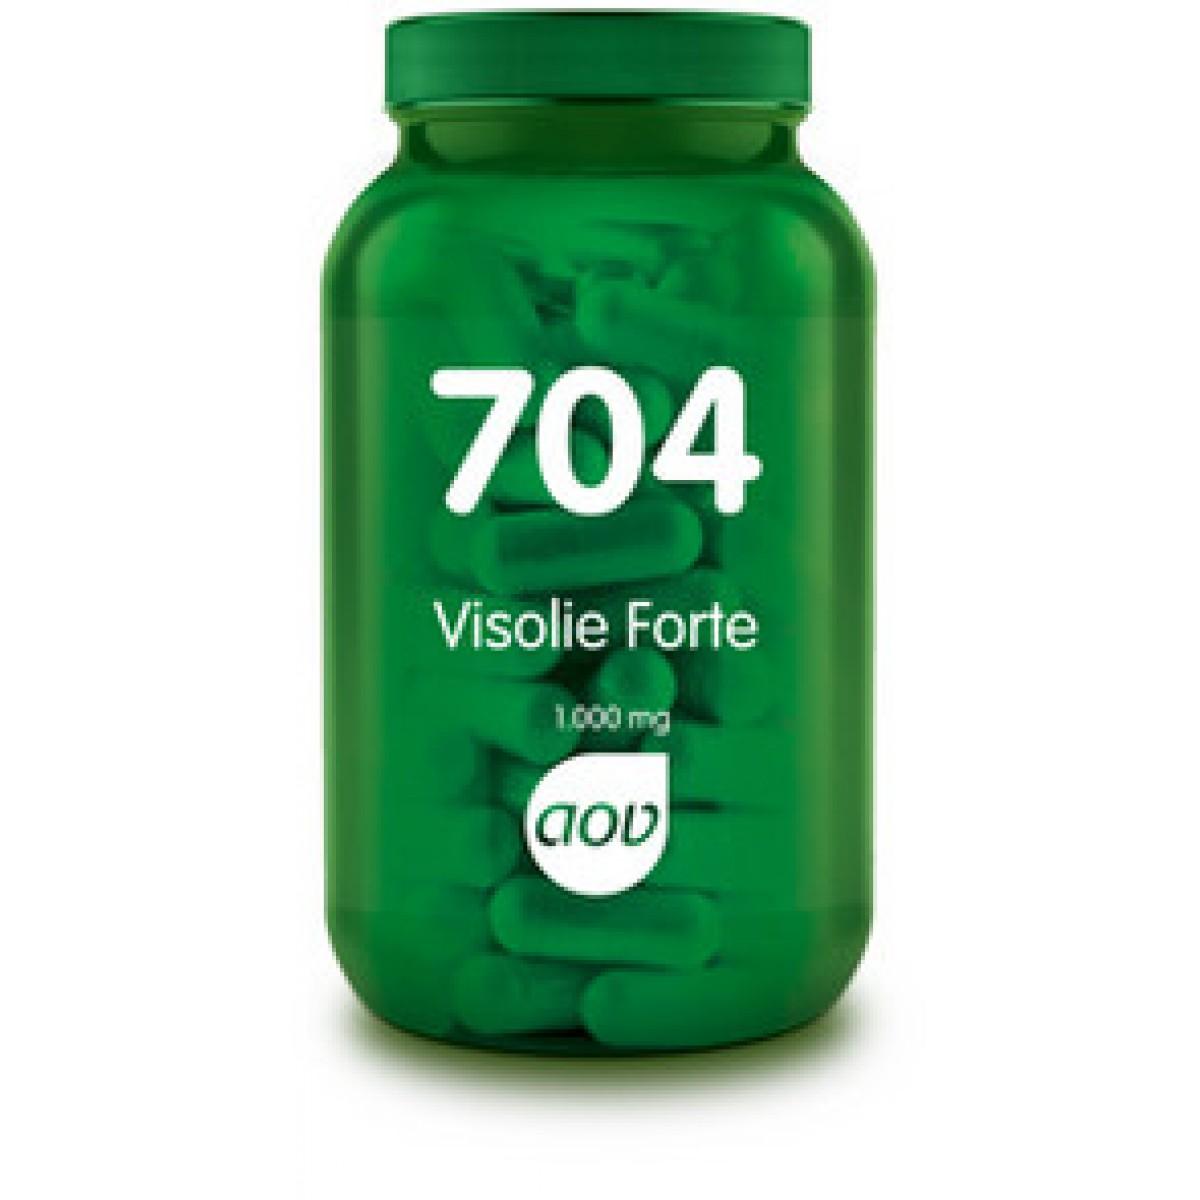 704 Visolie Forte